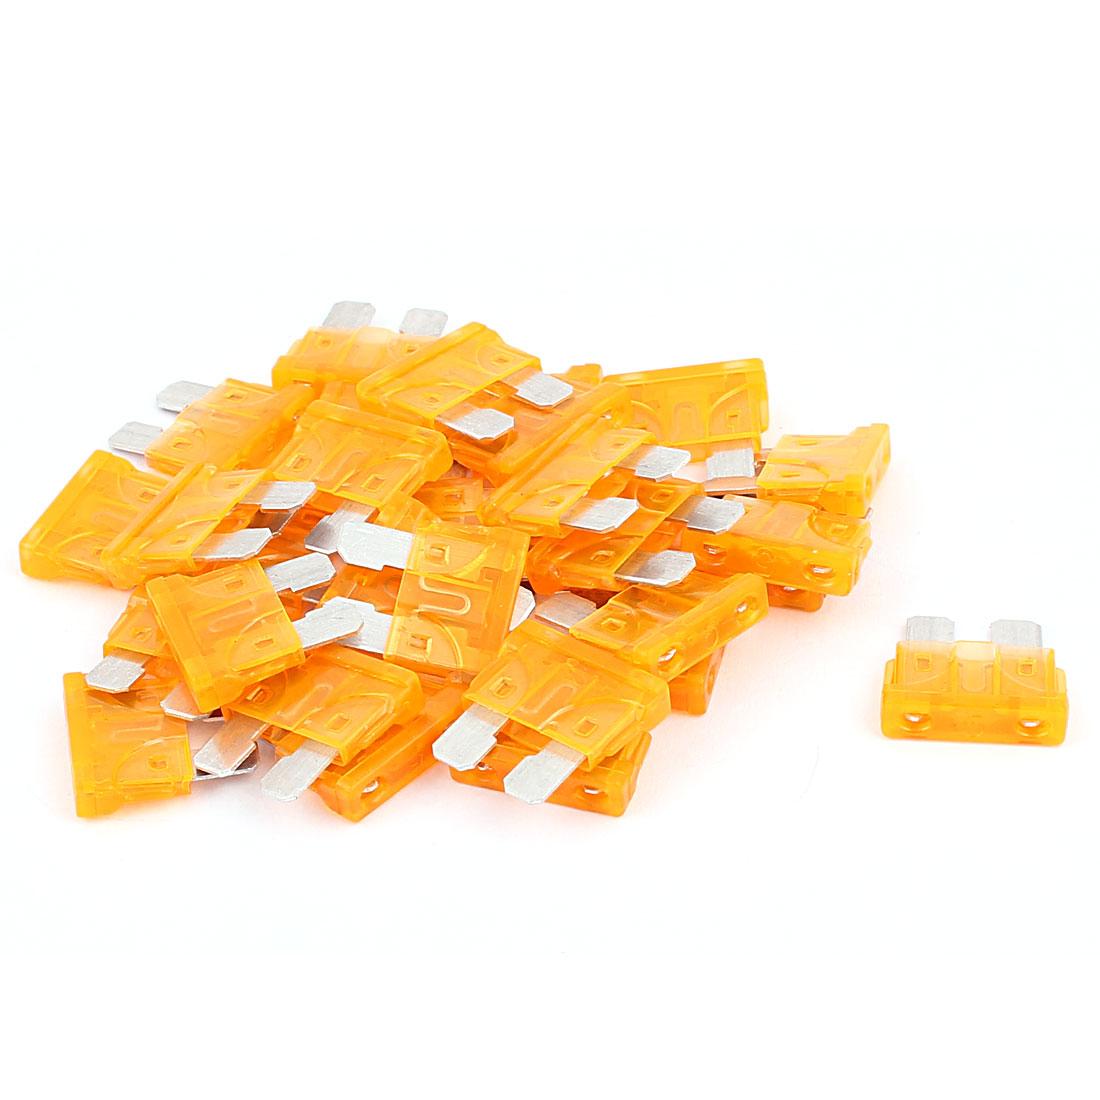 30pcs 5A Orange Plastic Housing Blade Fuse for Auto Car Caravan Truck SUV